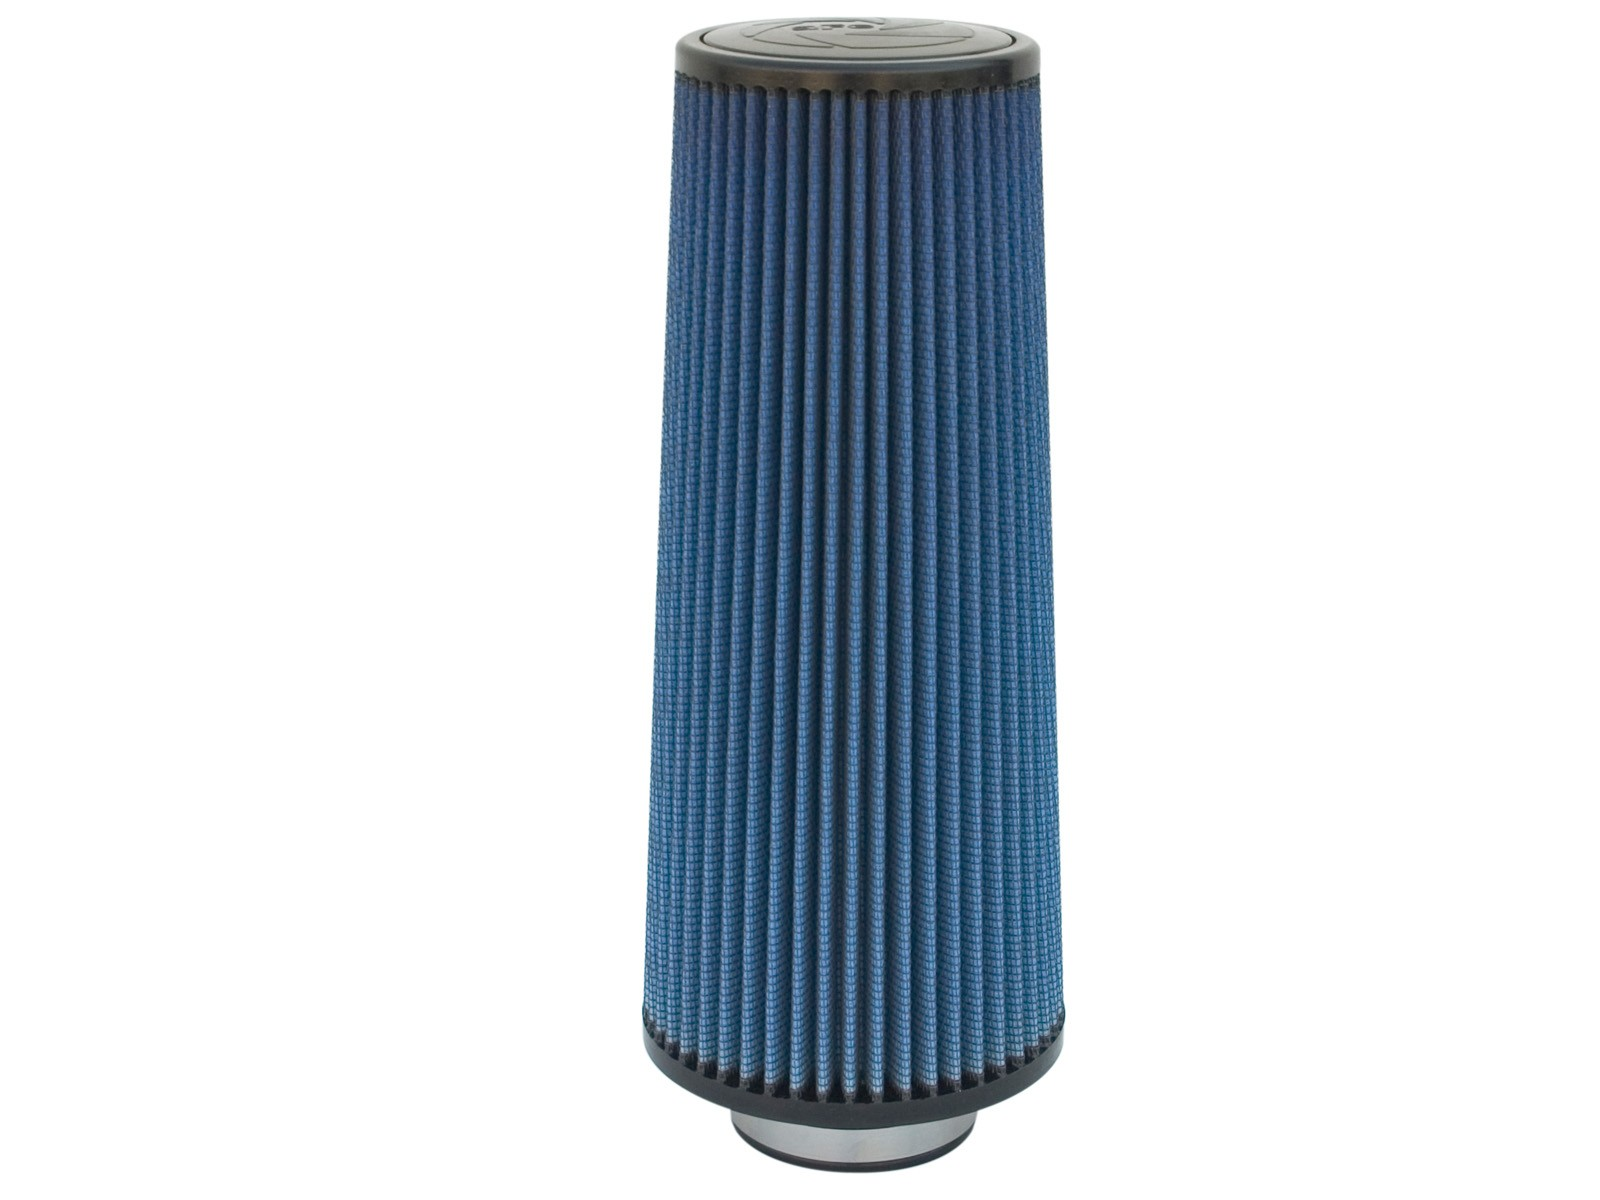 aFe POWER 24-30031 Magnum FLOW Pro 5R Air Filter